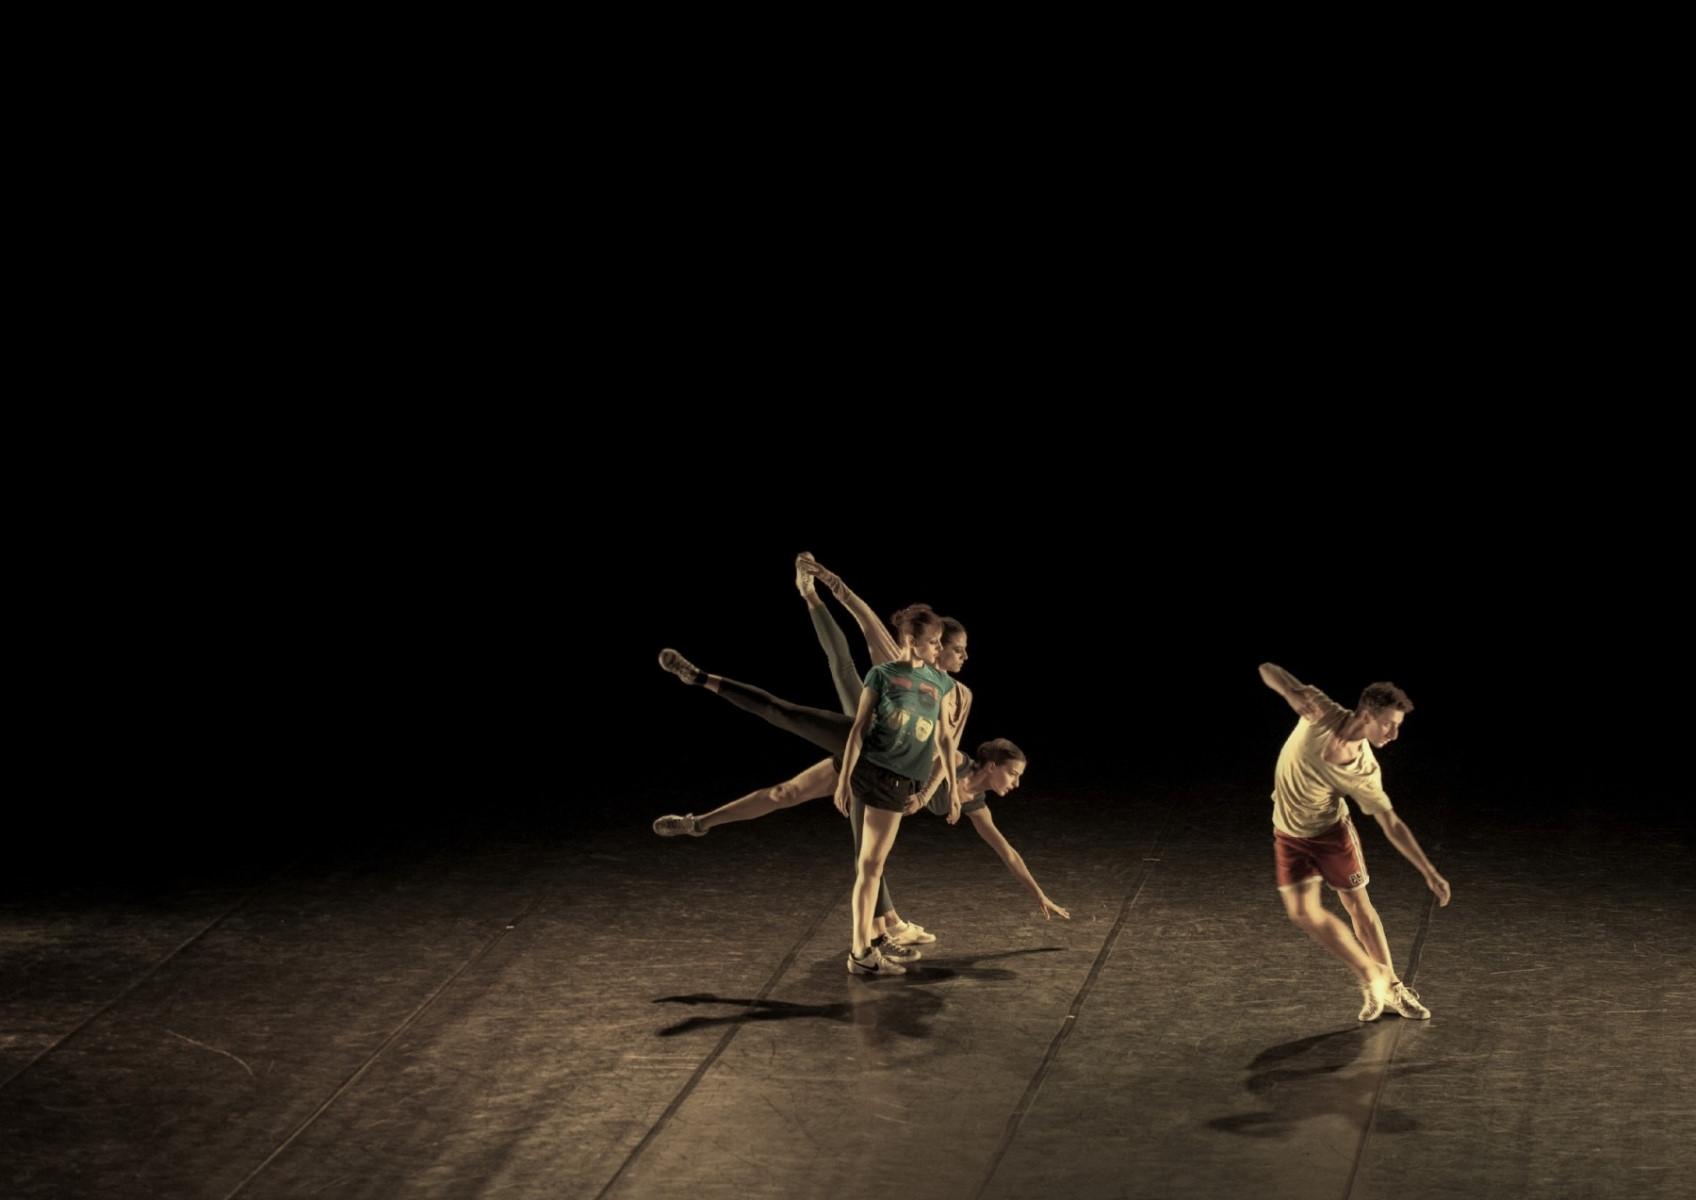 GRDC - Gabriele Rossi Dance Company